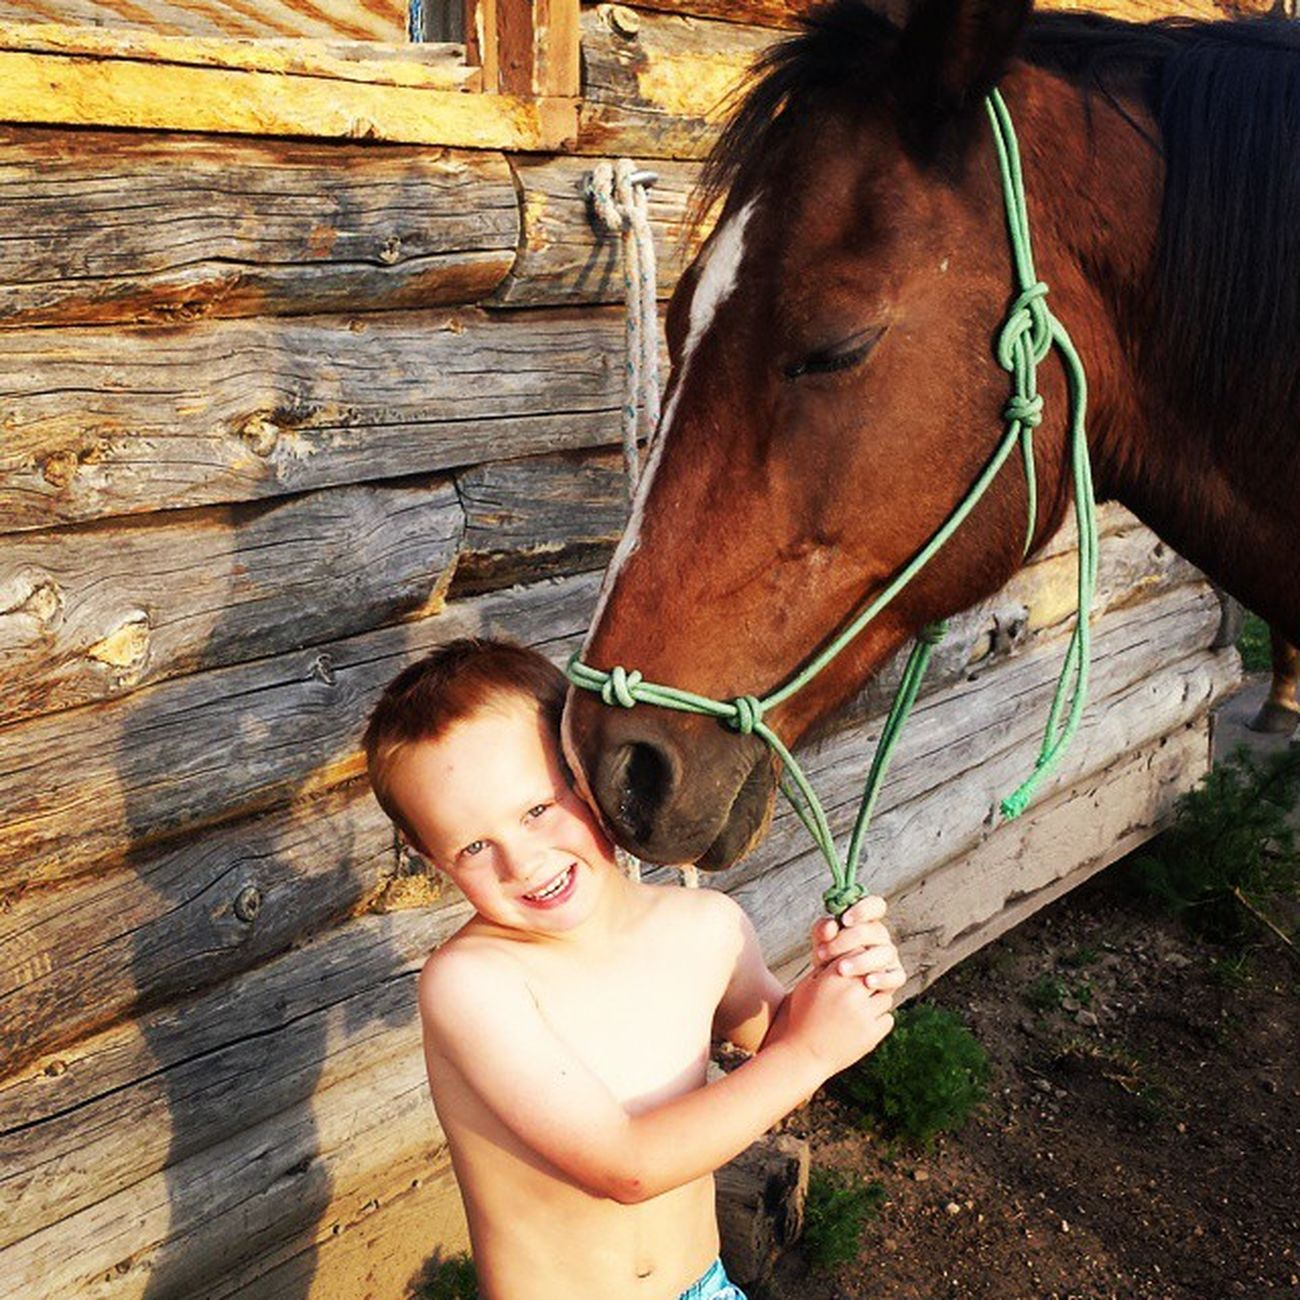 Overwhelmingly proud of my little cowboy! Ryleecarlos Cowboyintraining Mylittlecowboy Farmlife Countryboy Tetonvalley Idahogram Onlyinidaho Morgans Horse Horsesofinstagram Cowboy Proudmama Hesonlyfive Papasboy